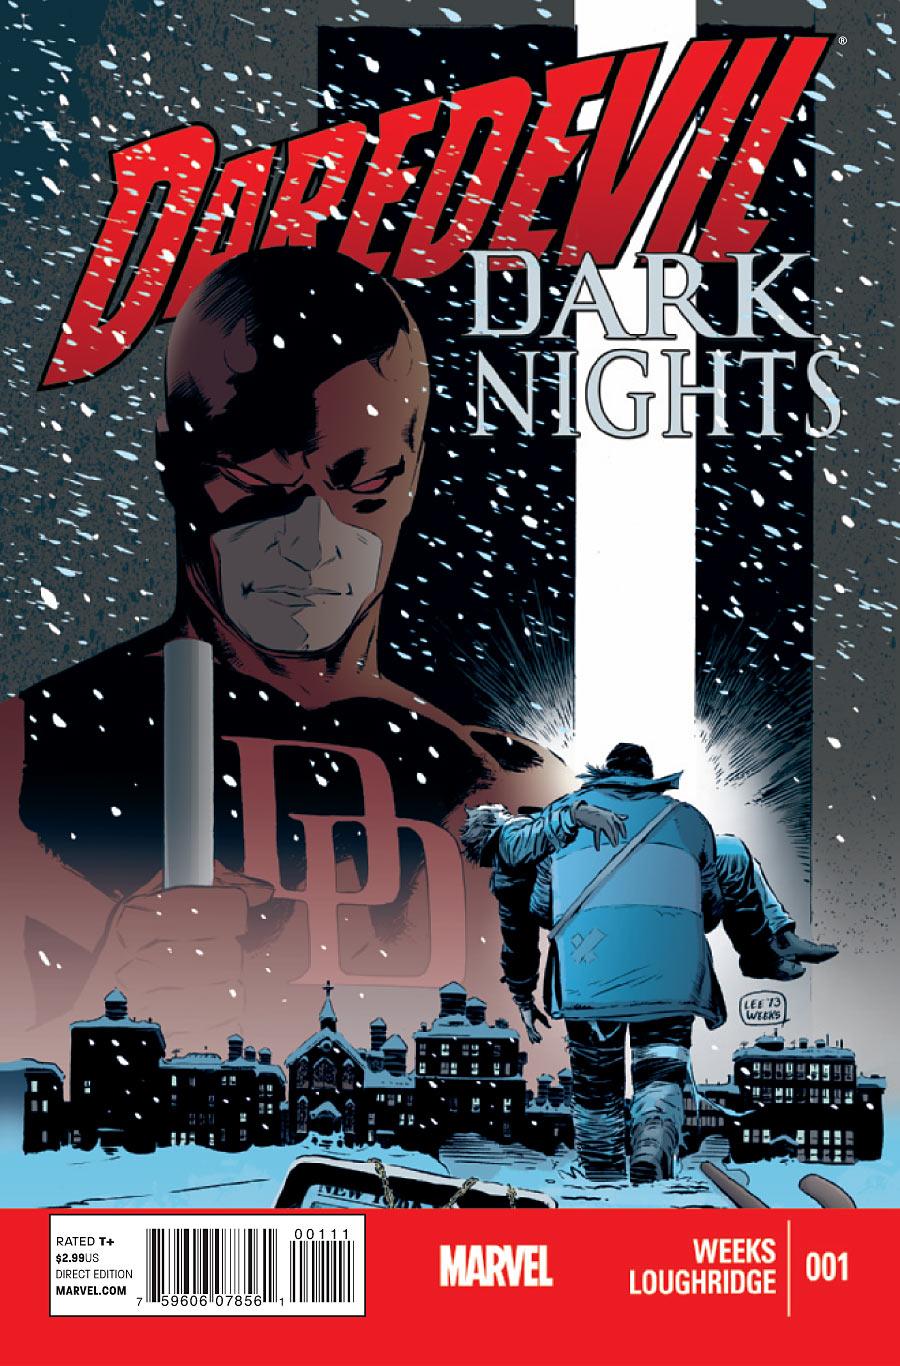 """Daredevil: Dark Nights"" No. 1, by Lee Weeks and Lee Loughridge.  (Marvel Comics Photo)"